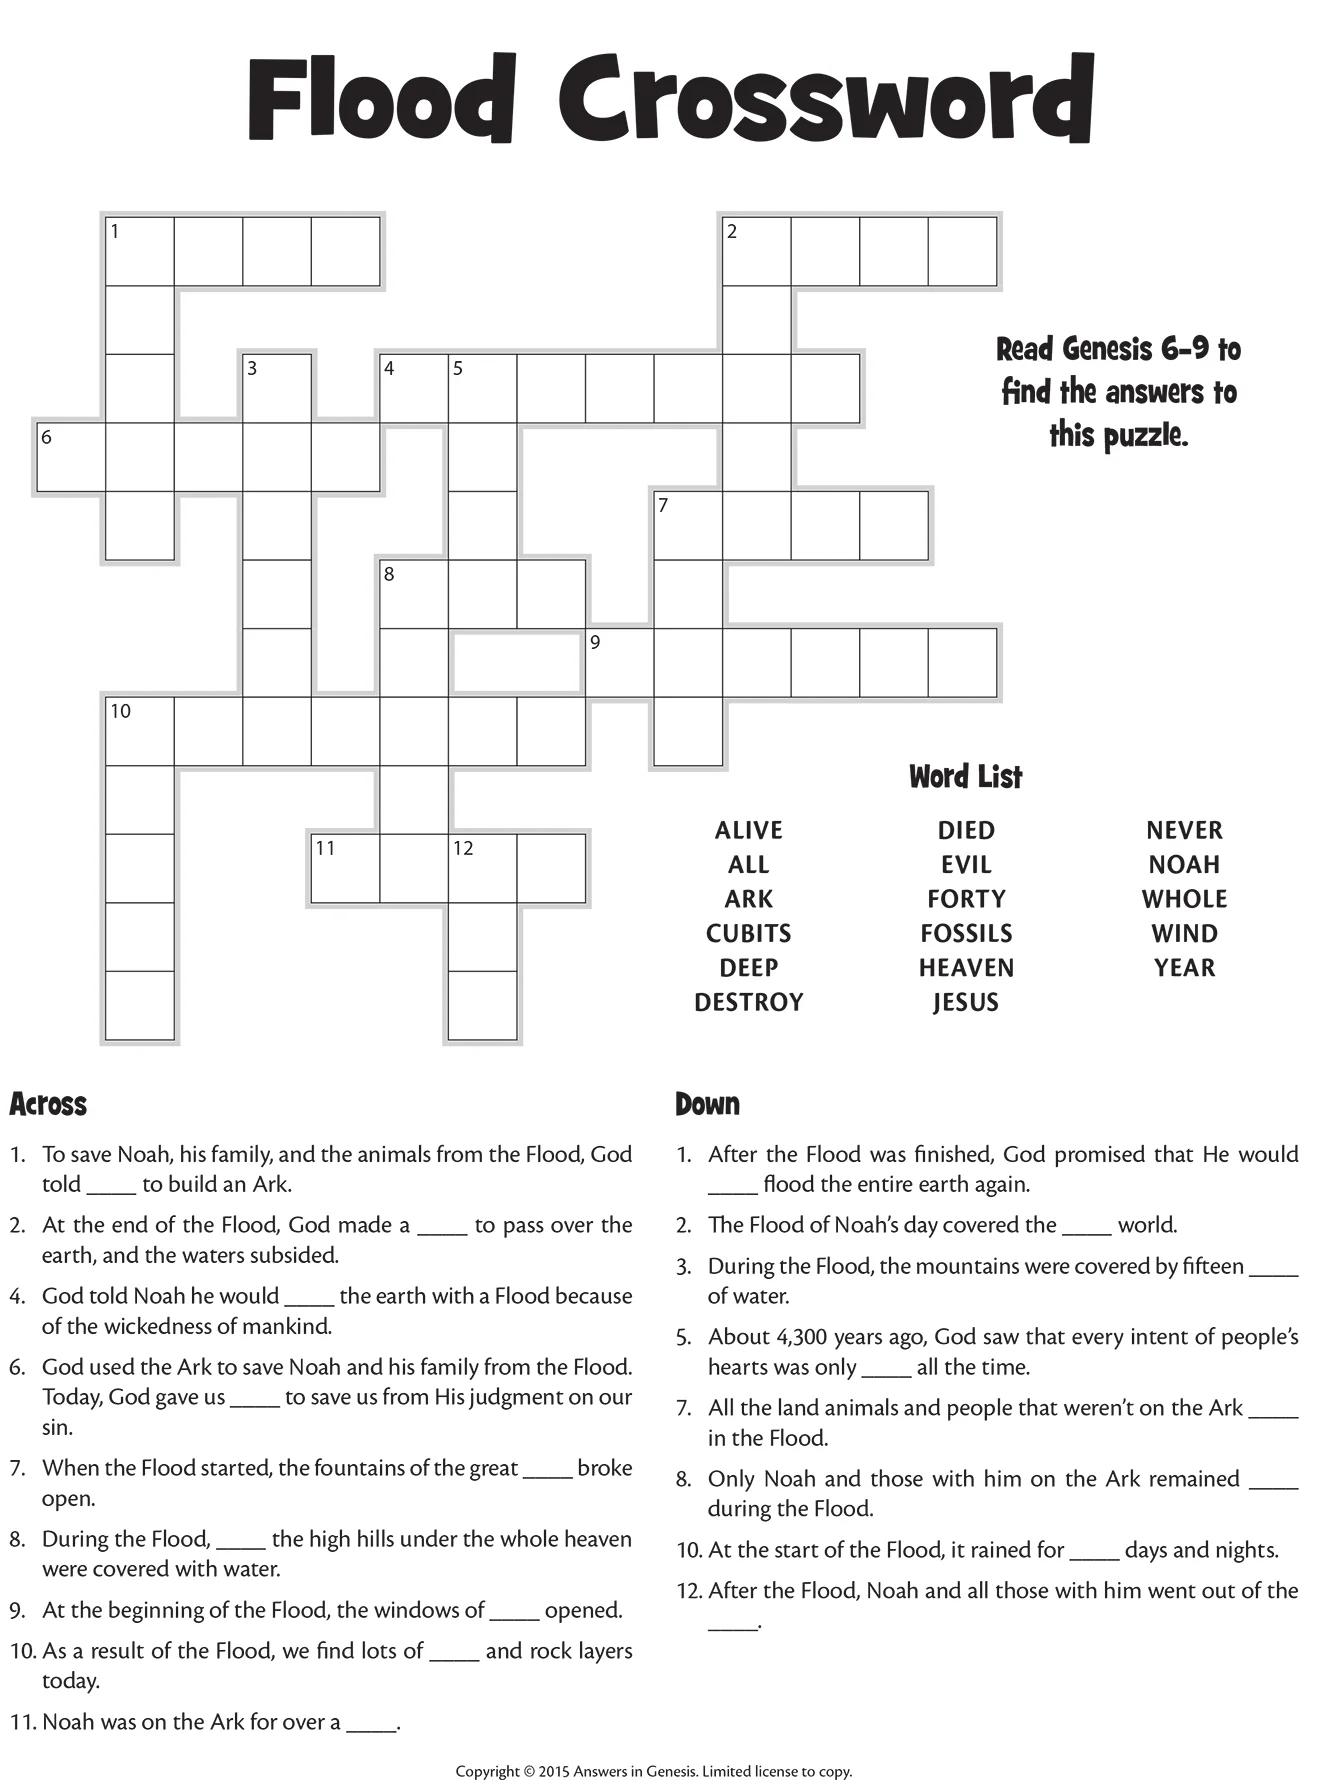 Flood Crossword